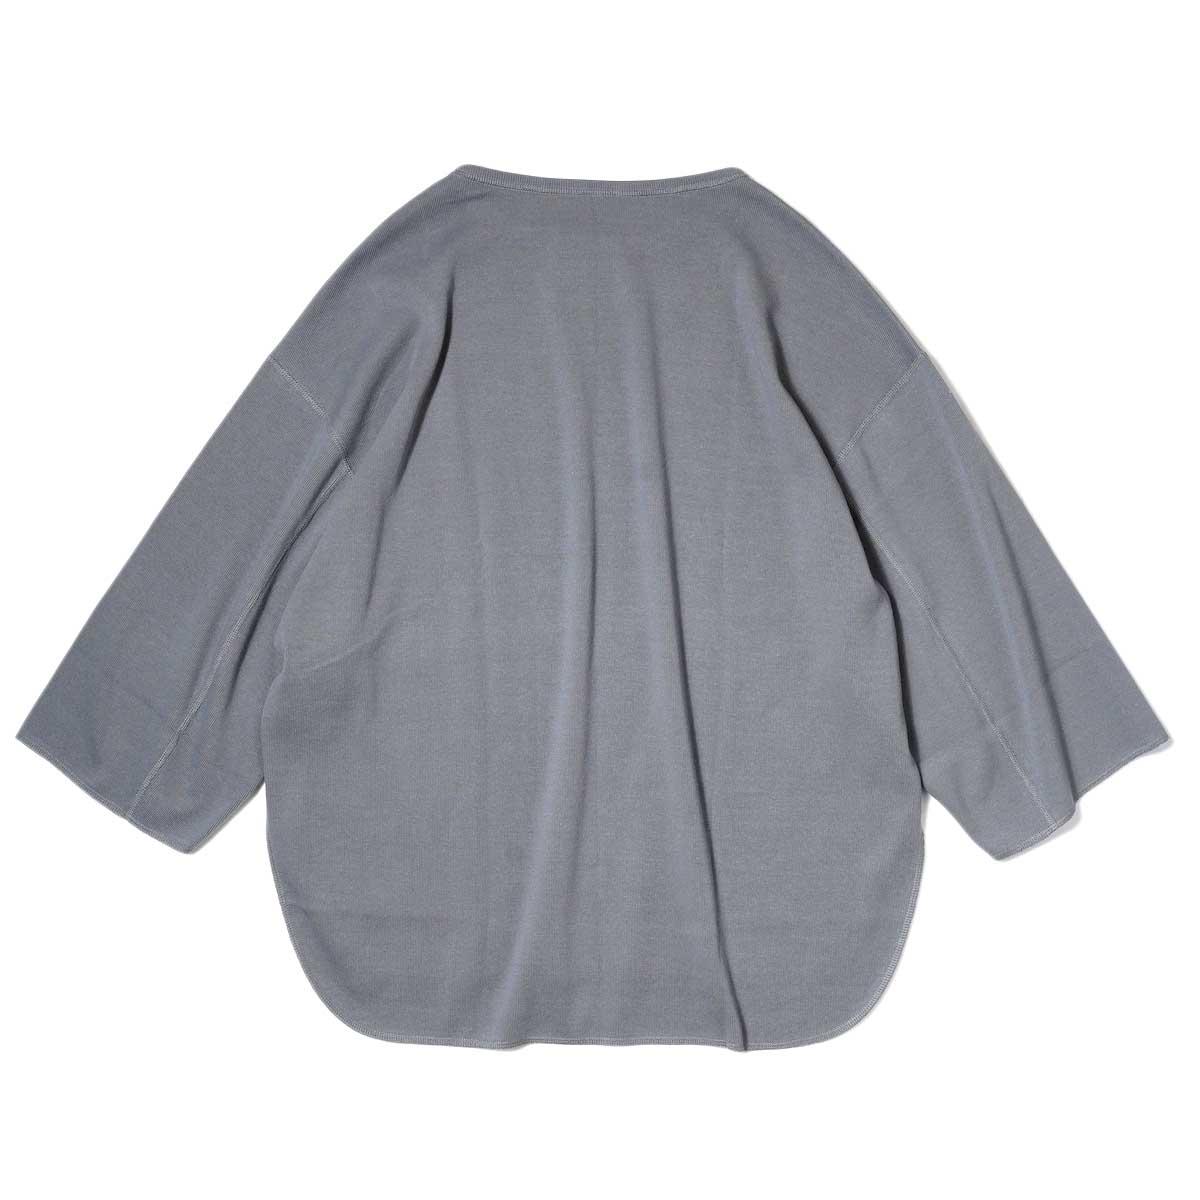 YLEVE / CTN RIB P/O BIG (Grey) 背面